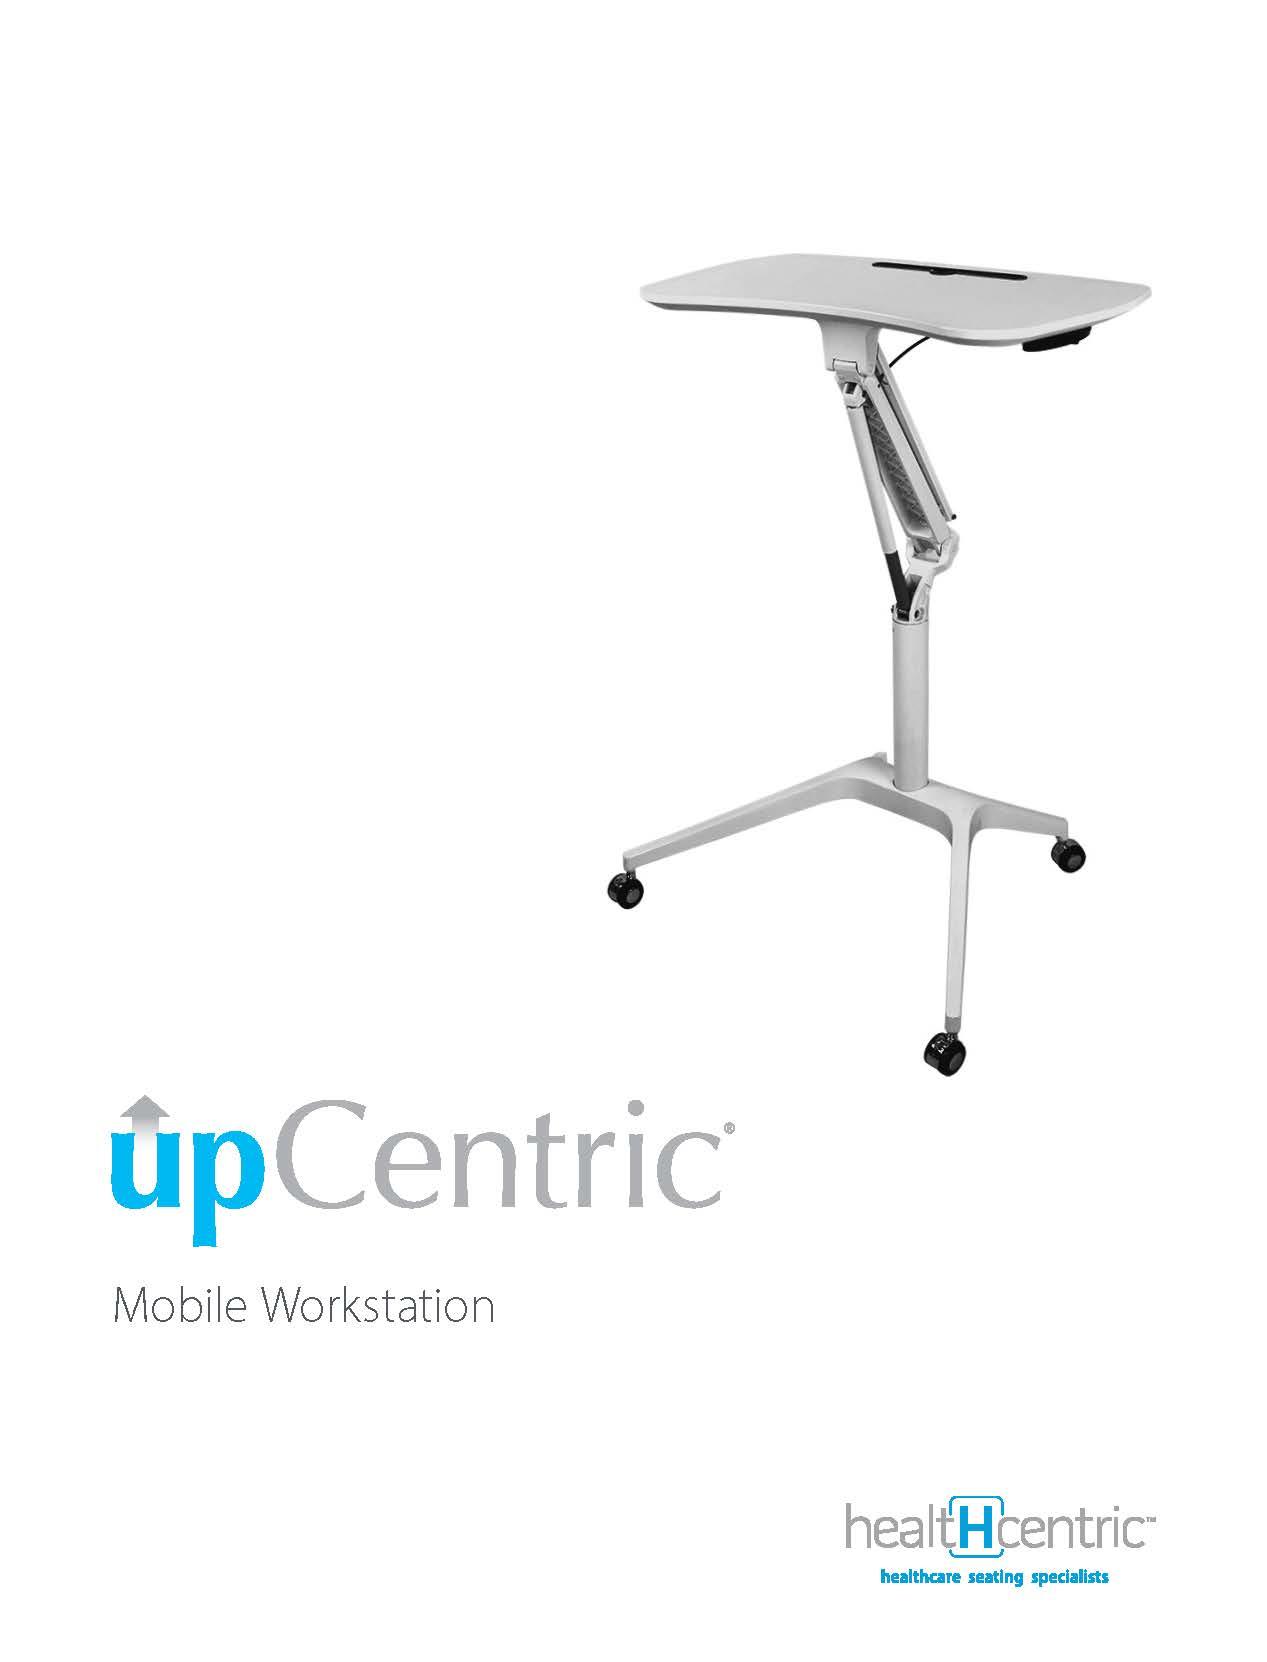 upCentric Mobile Workstation